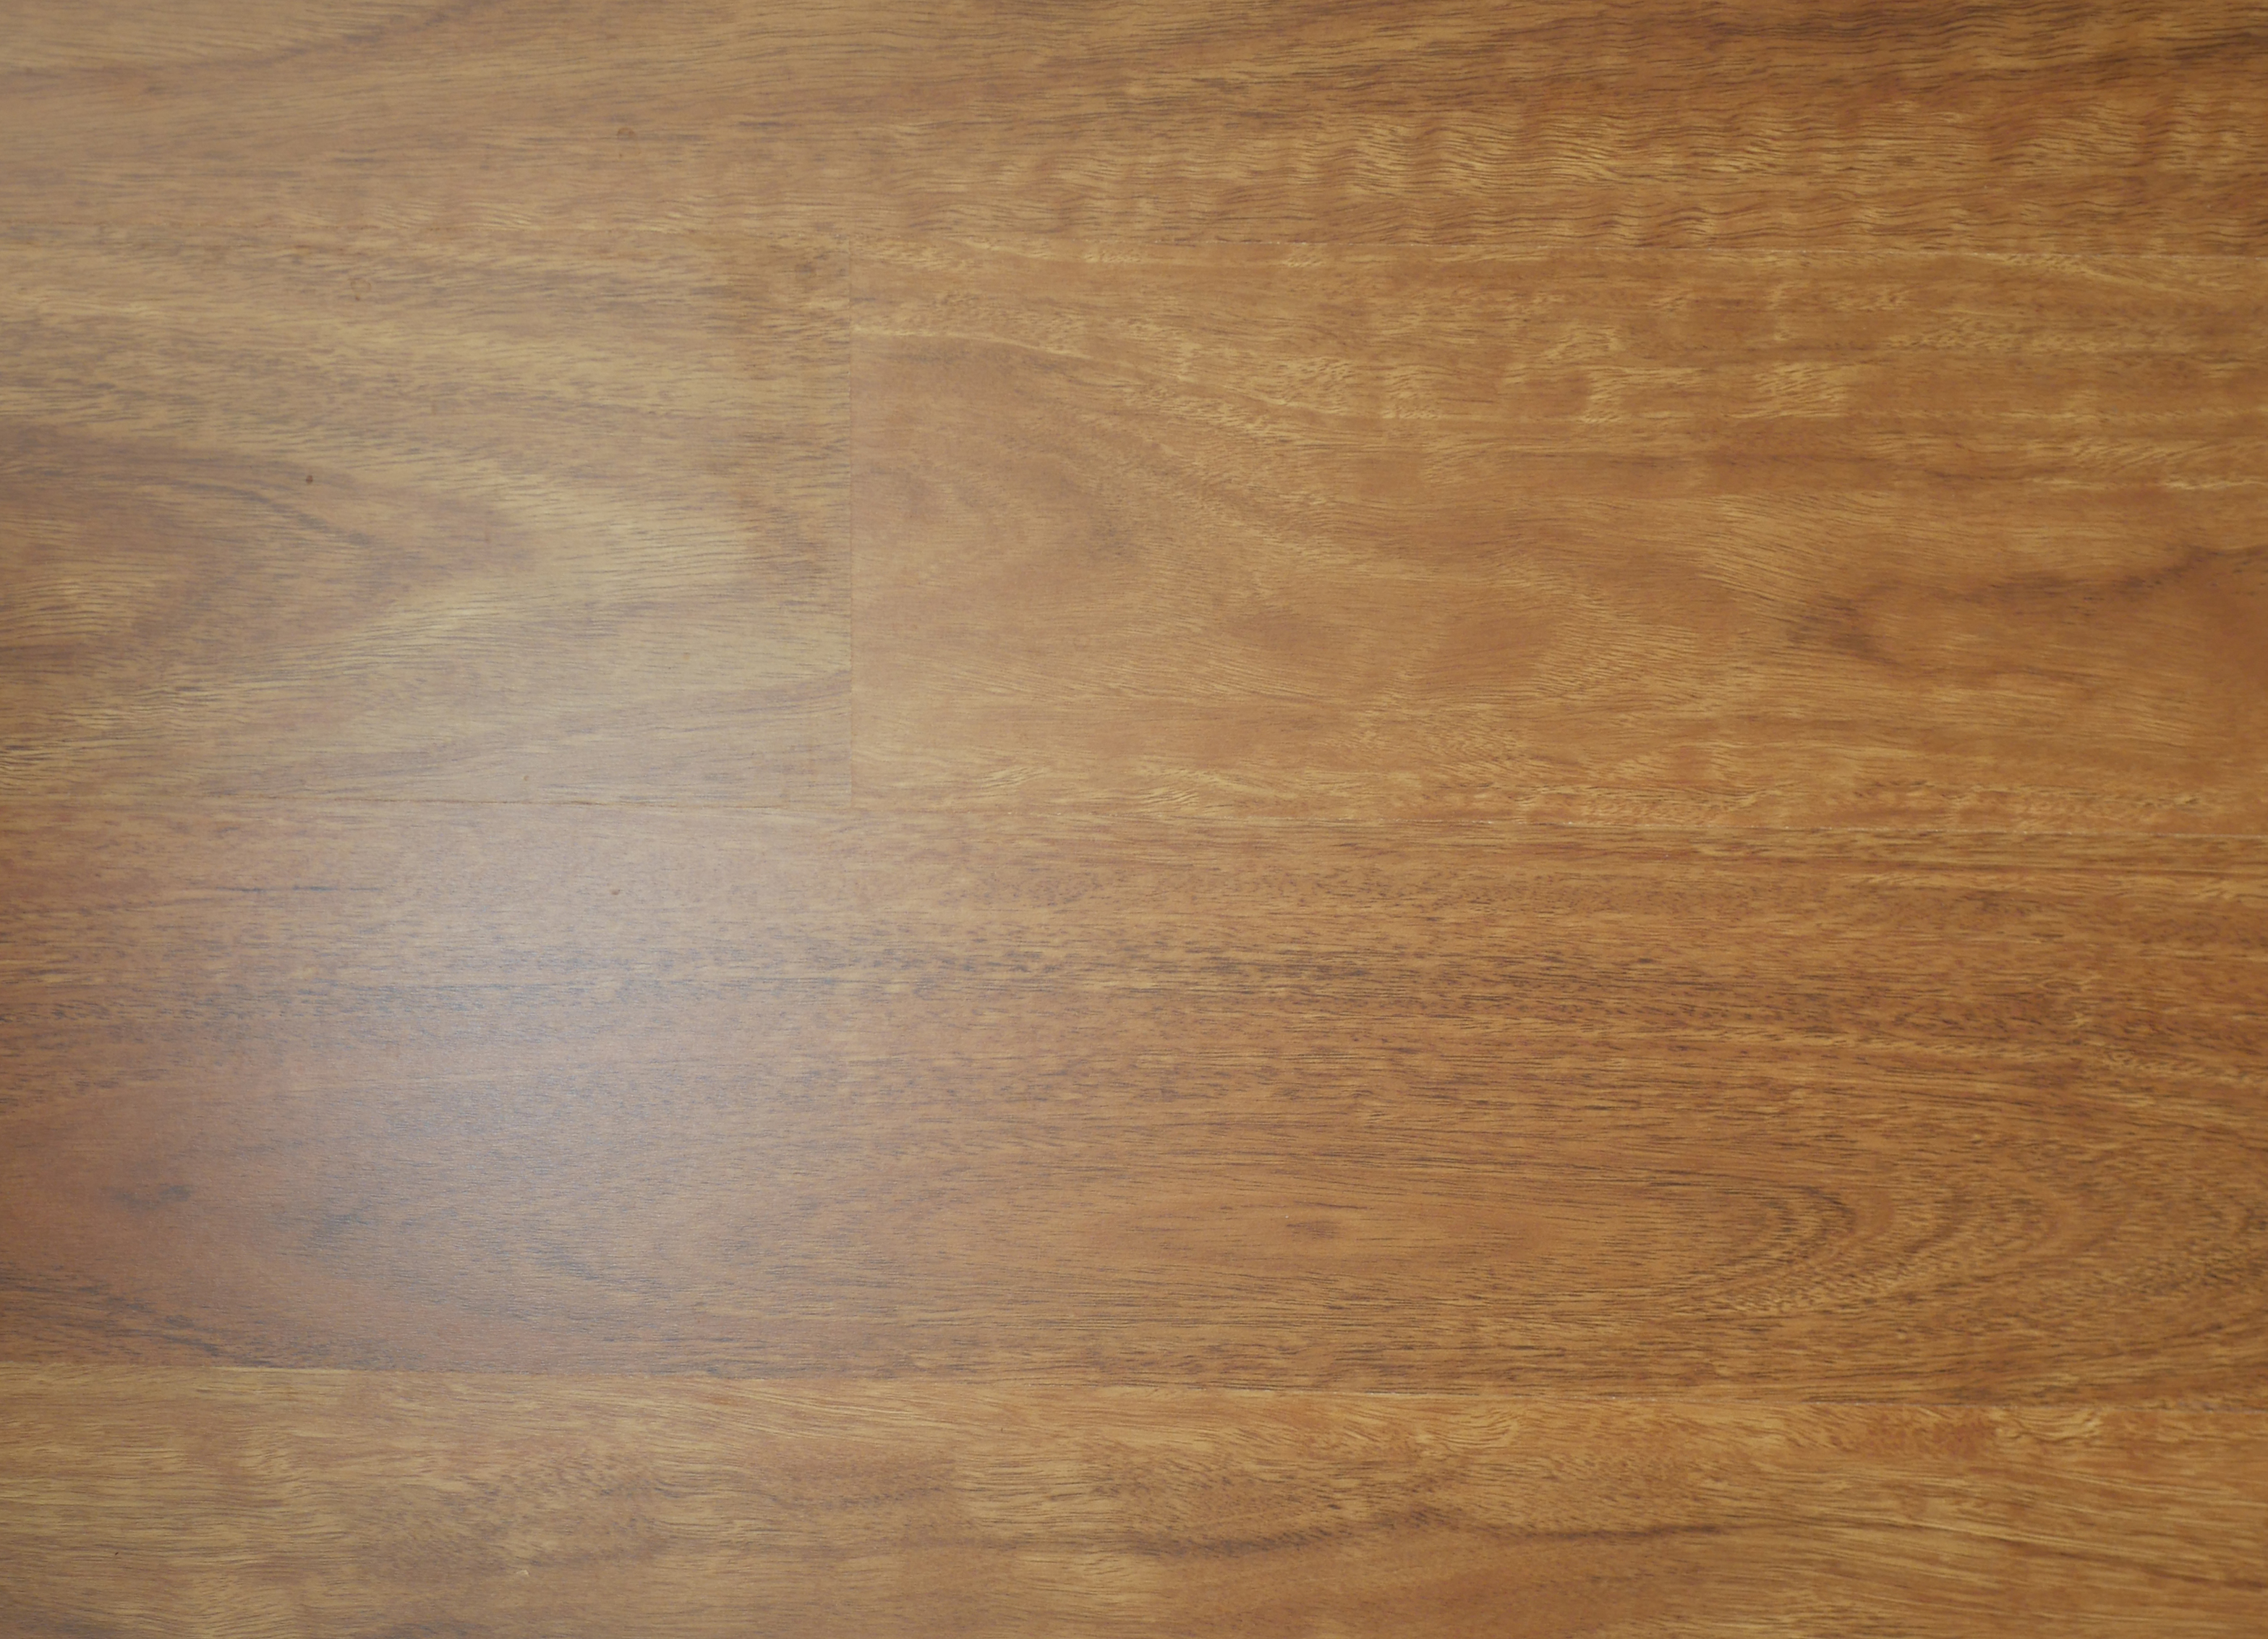 Sun Floors Imports- QSE- Spotted Gum